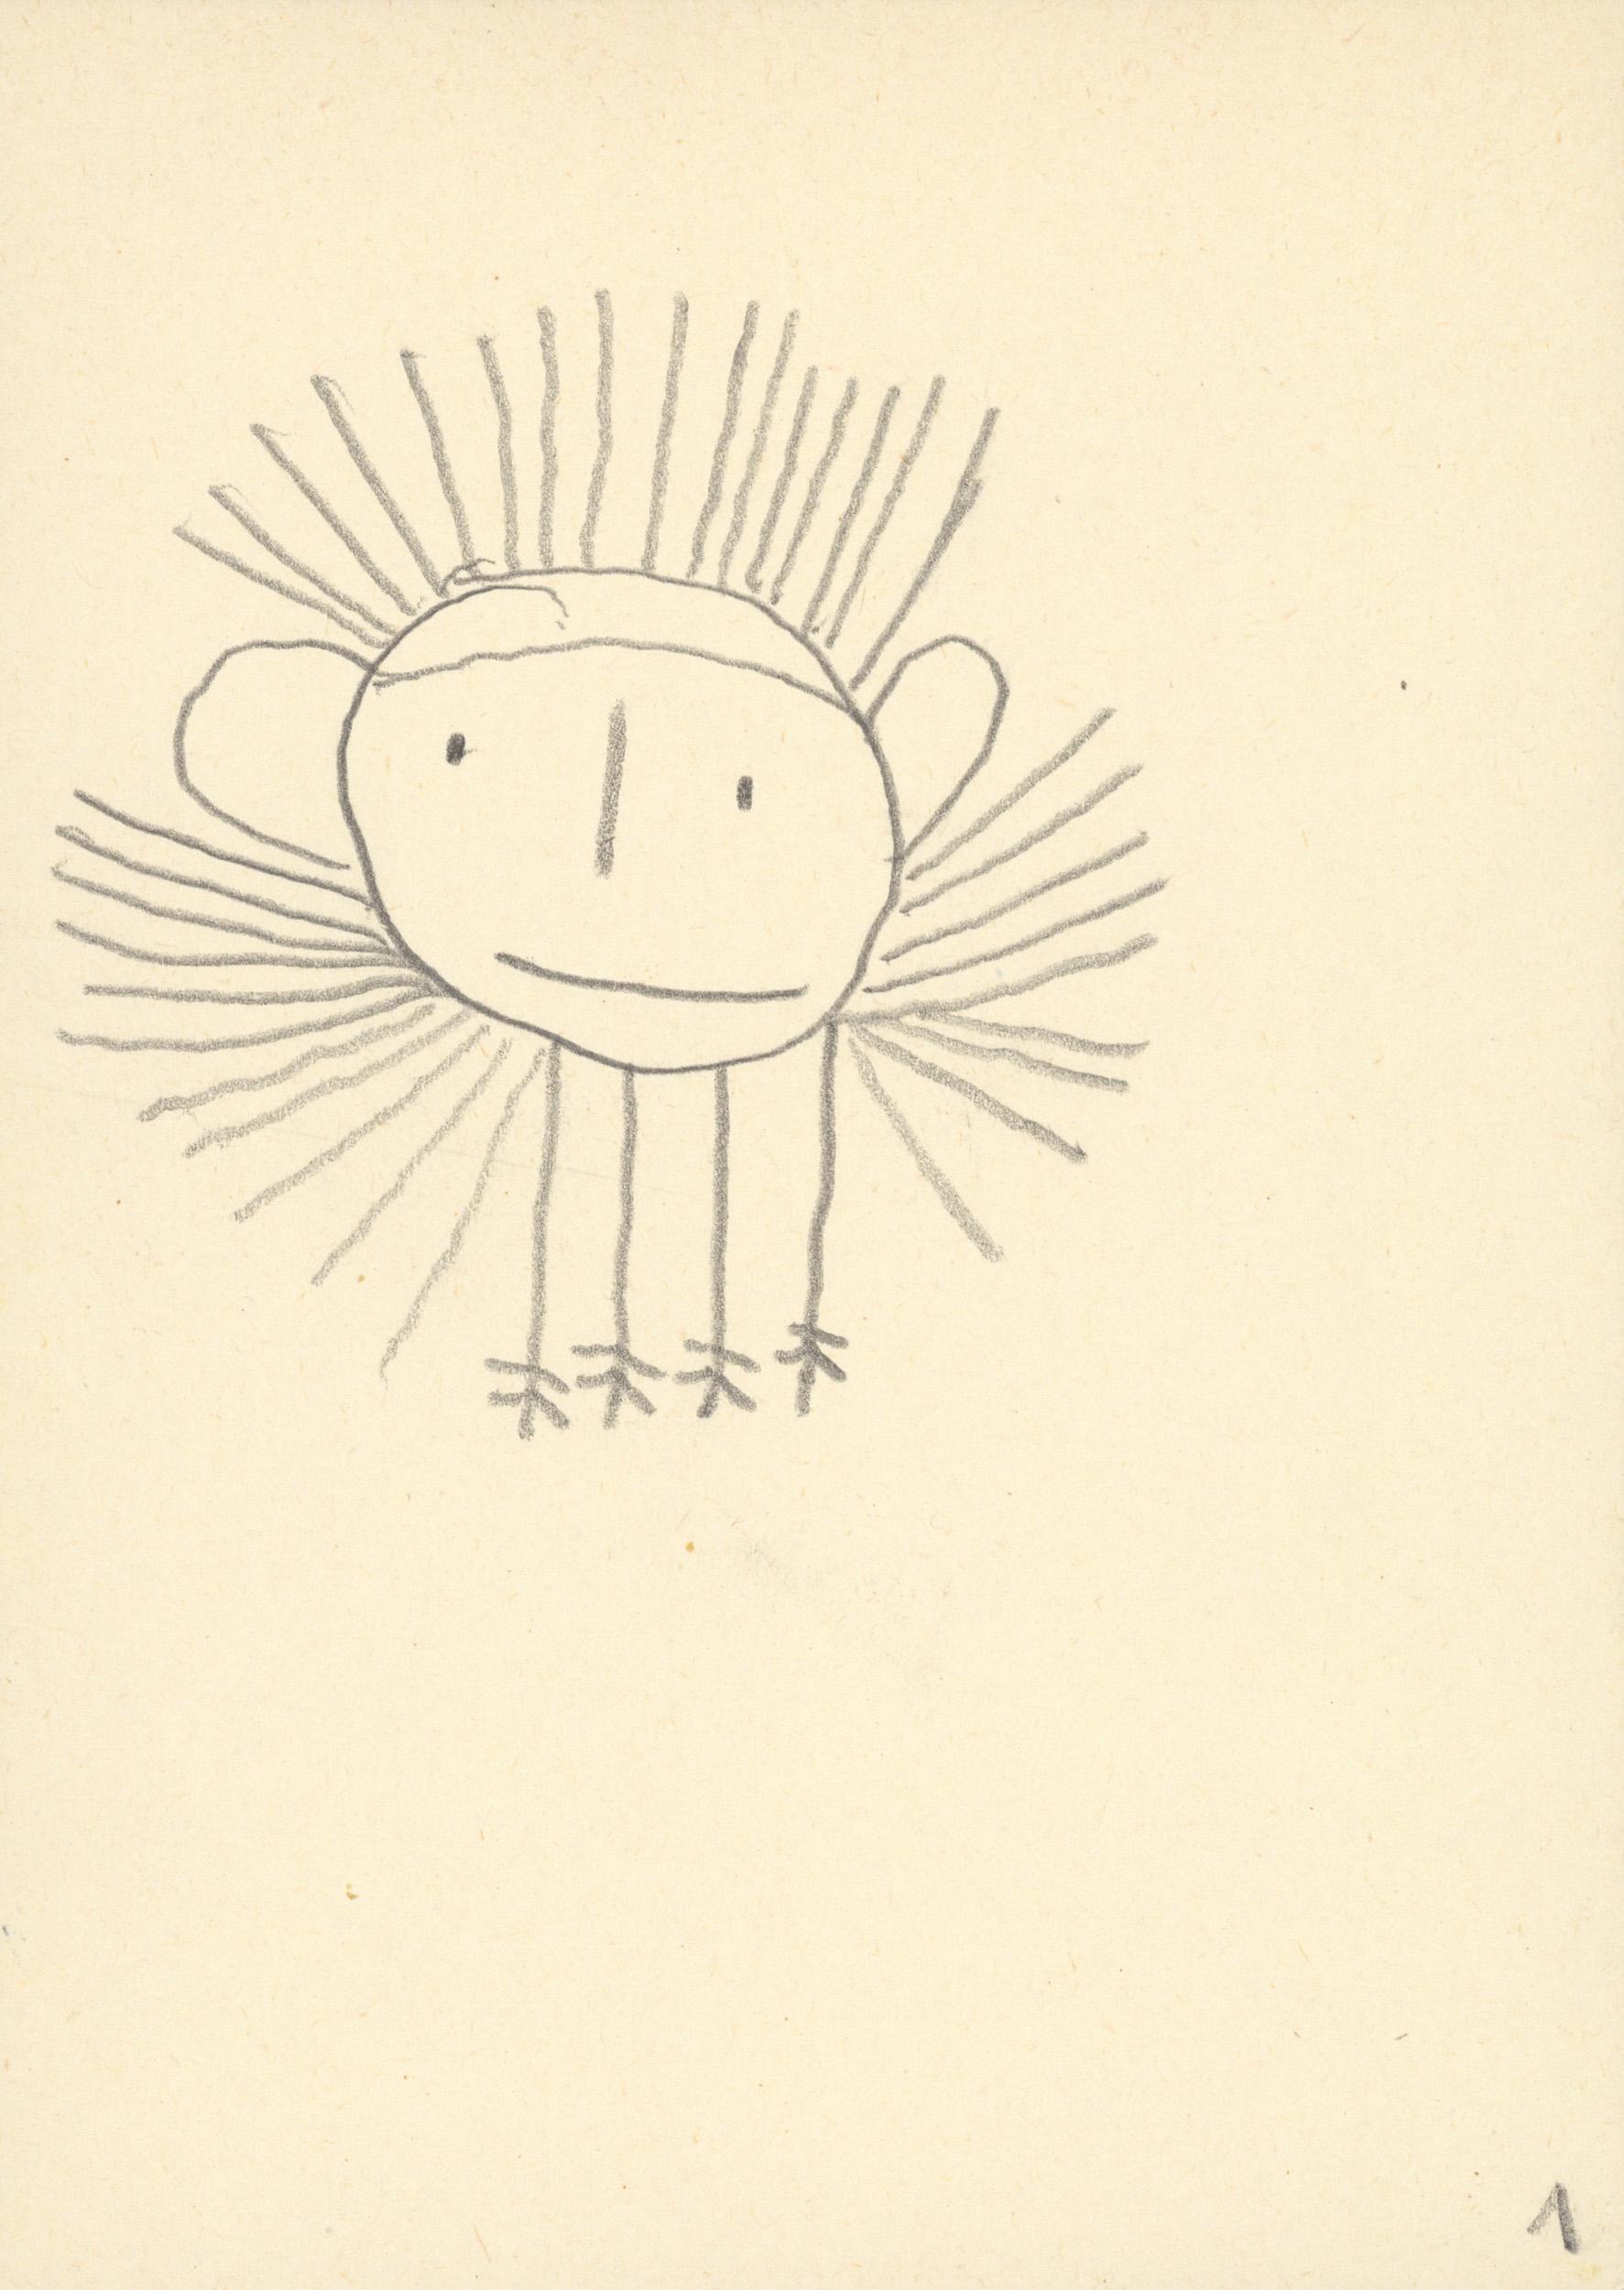 rosskopf karoline - Ohne Titel / Untitled